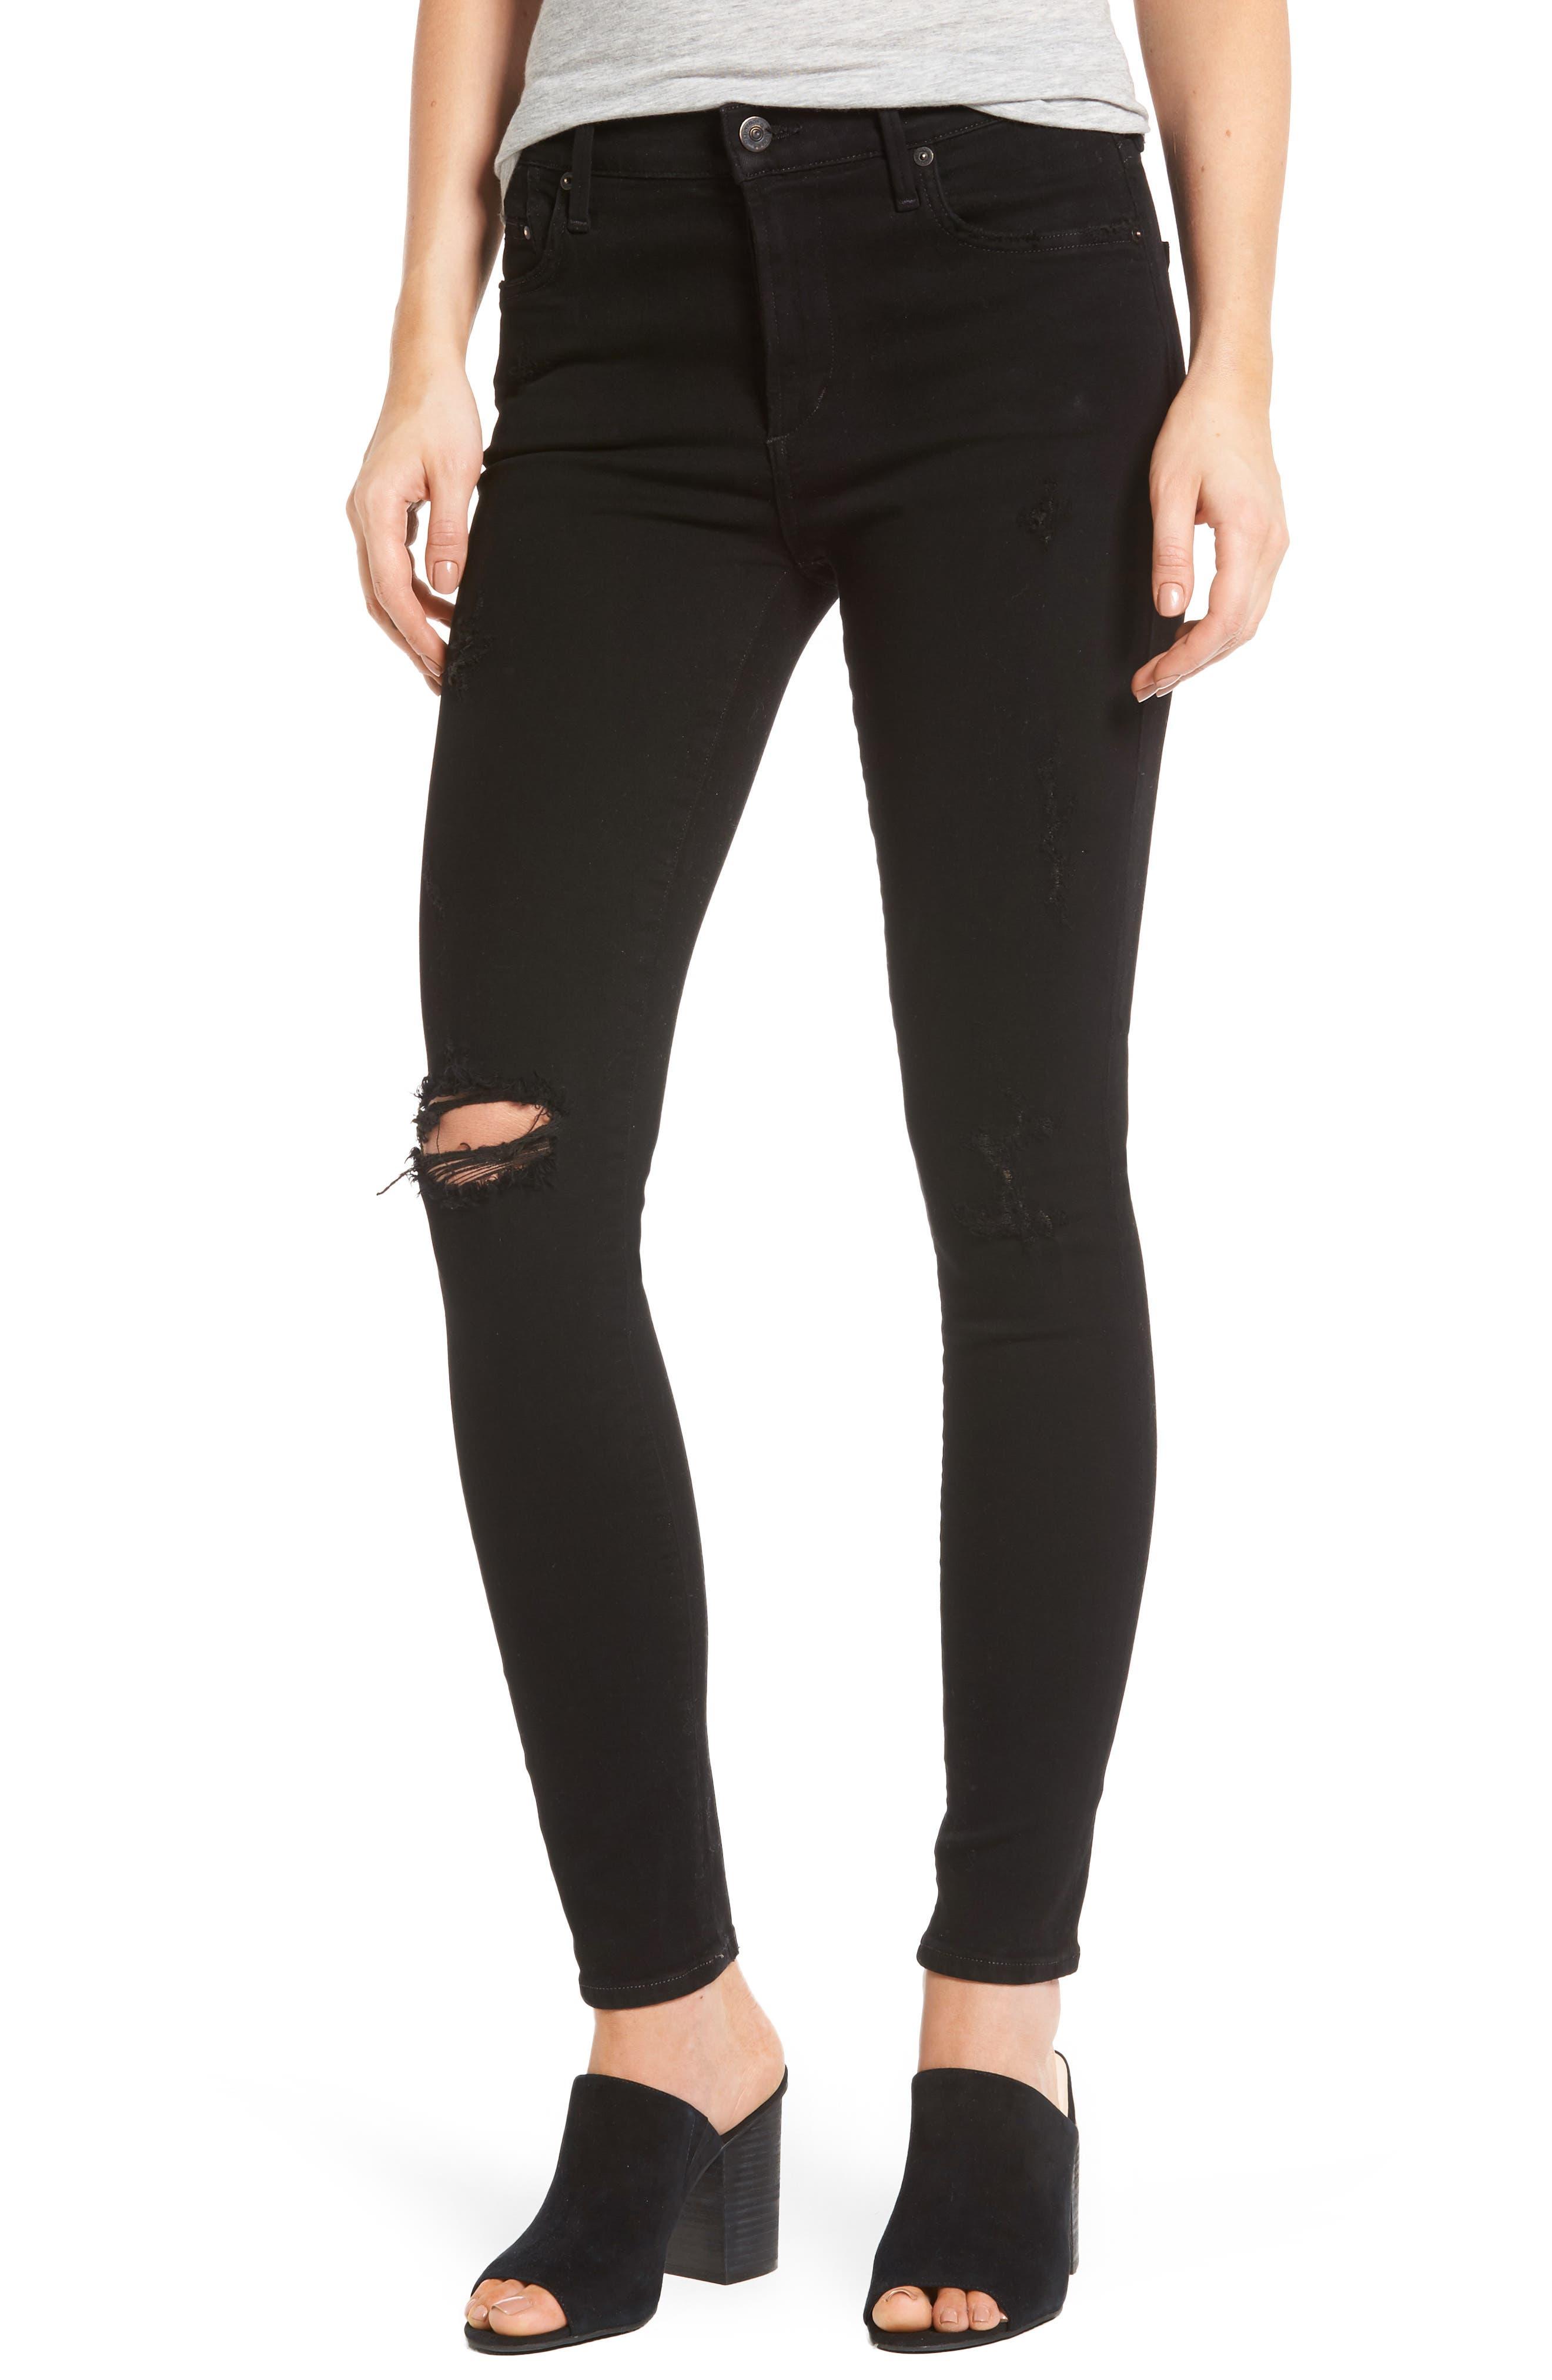 Rocket High Waist Skinny Jeans,                         Main,                         color, Black Echoes